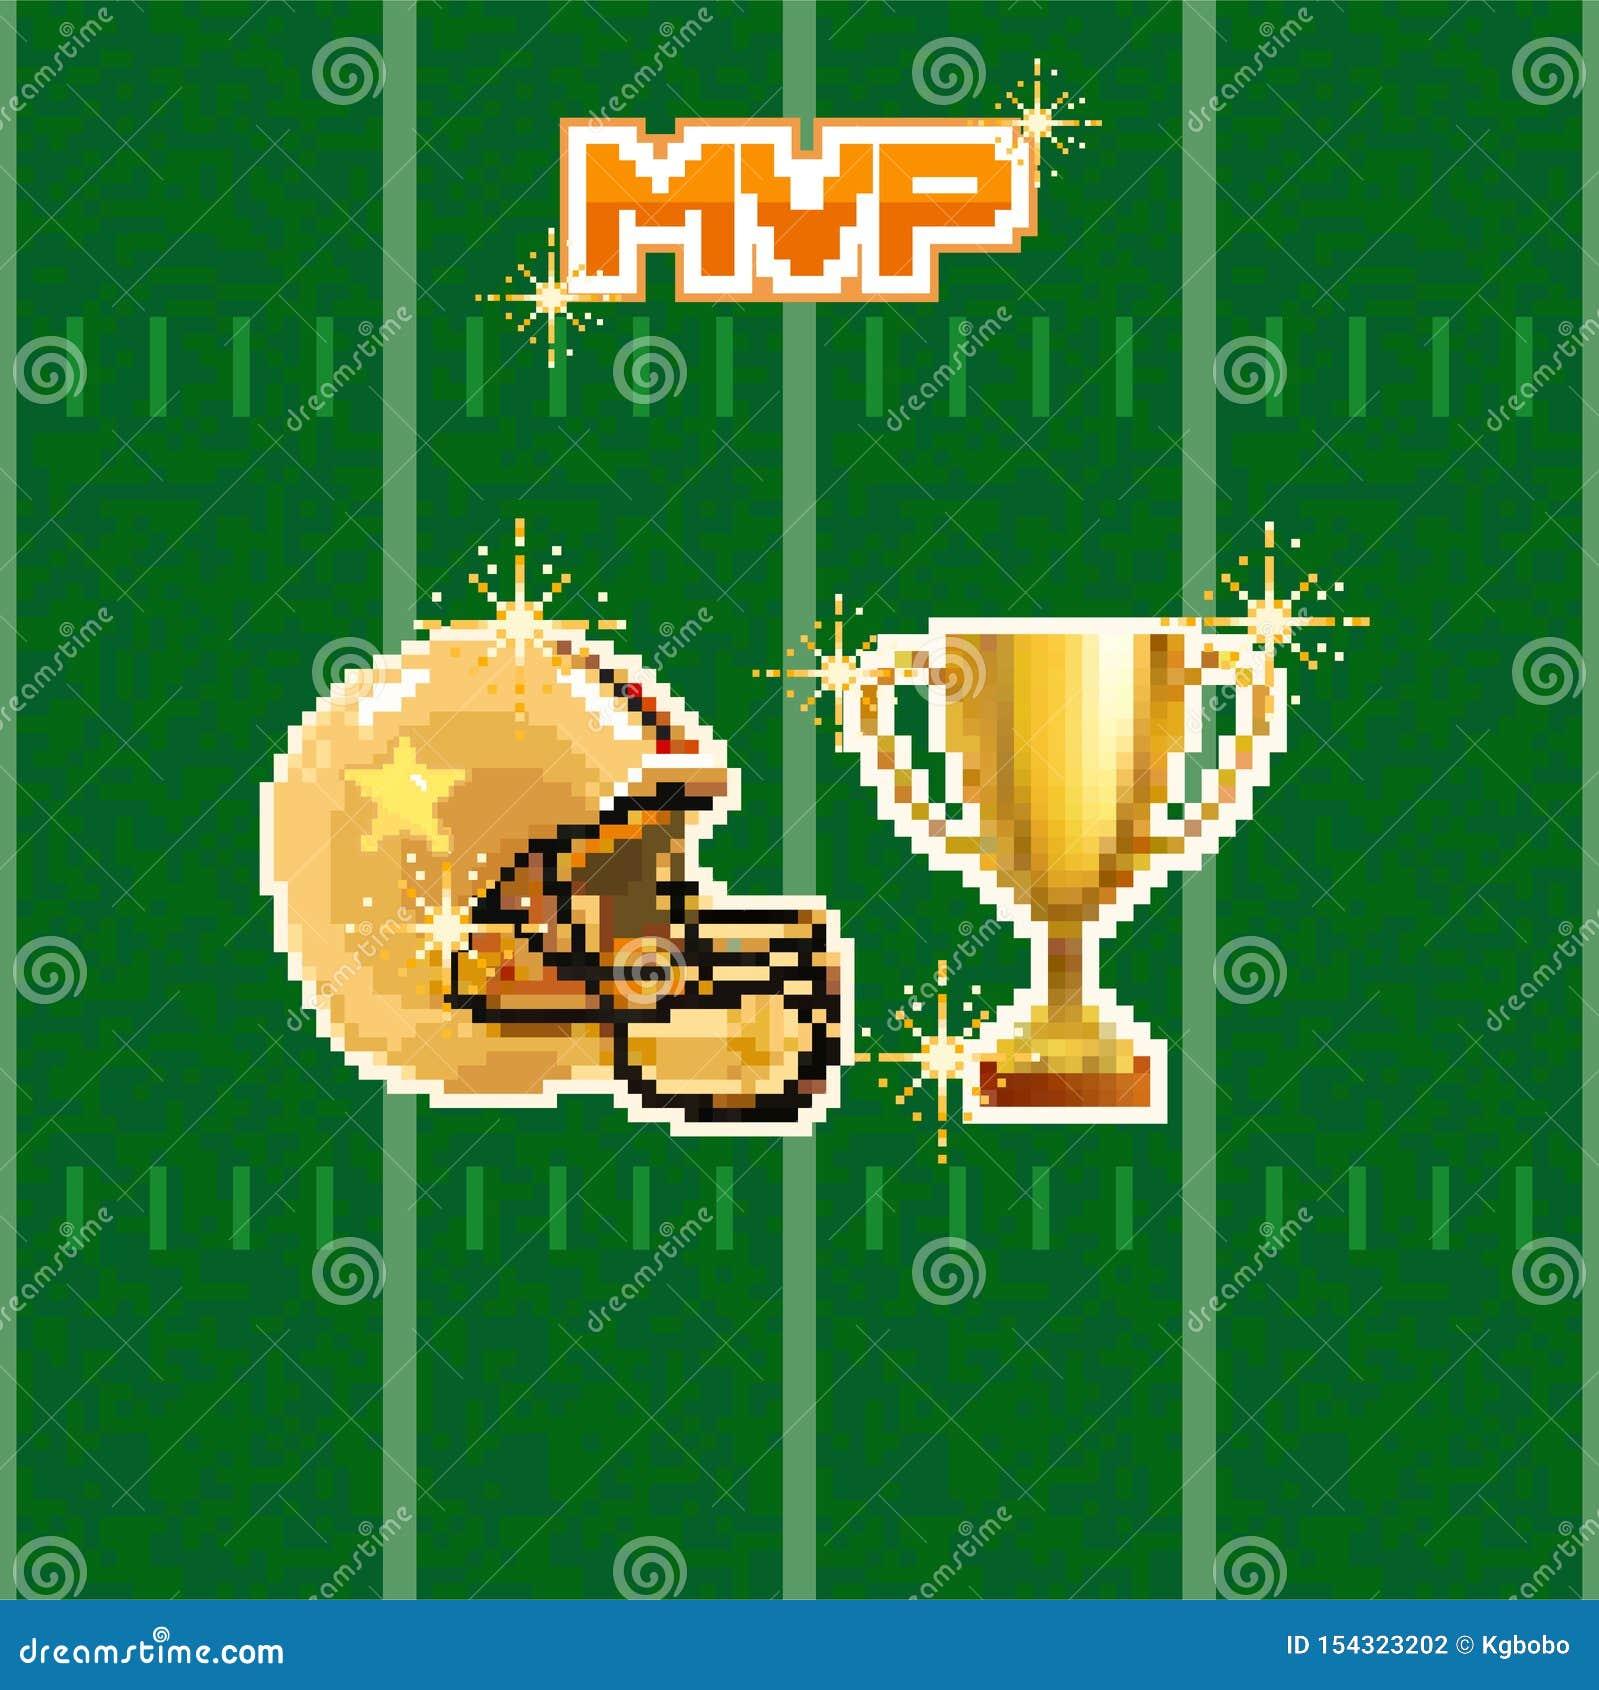 American Football Pixel Art Stock Vector Illustration Of